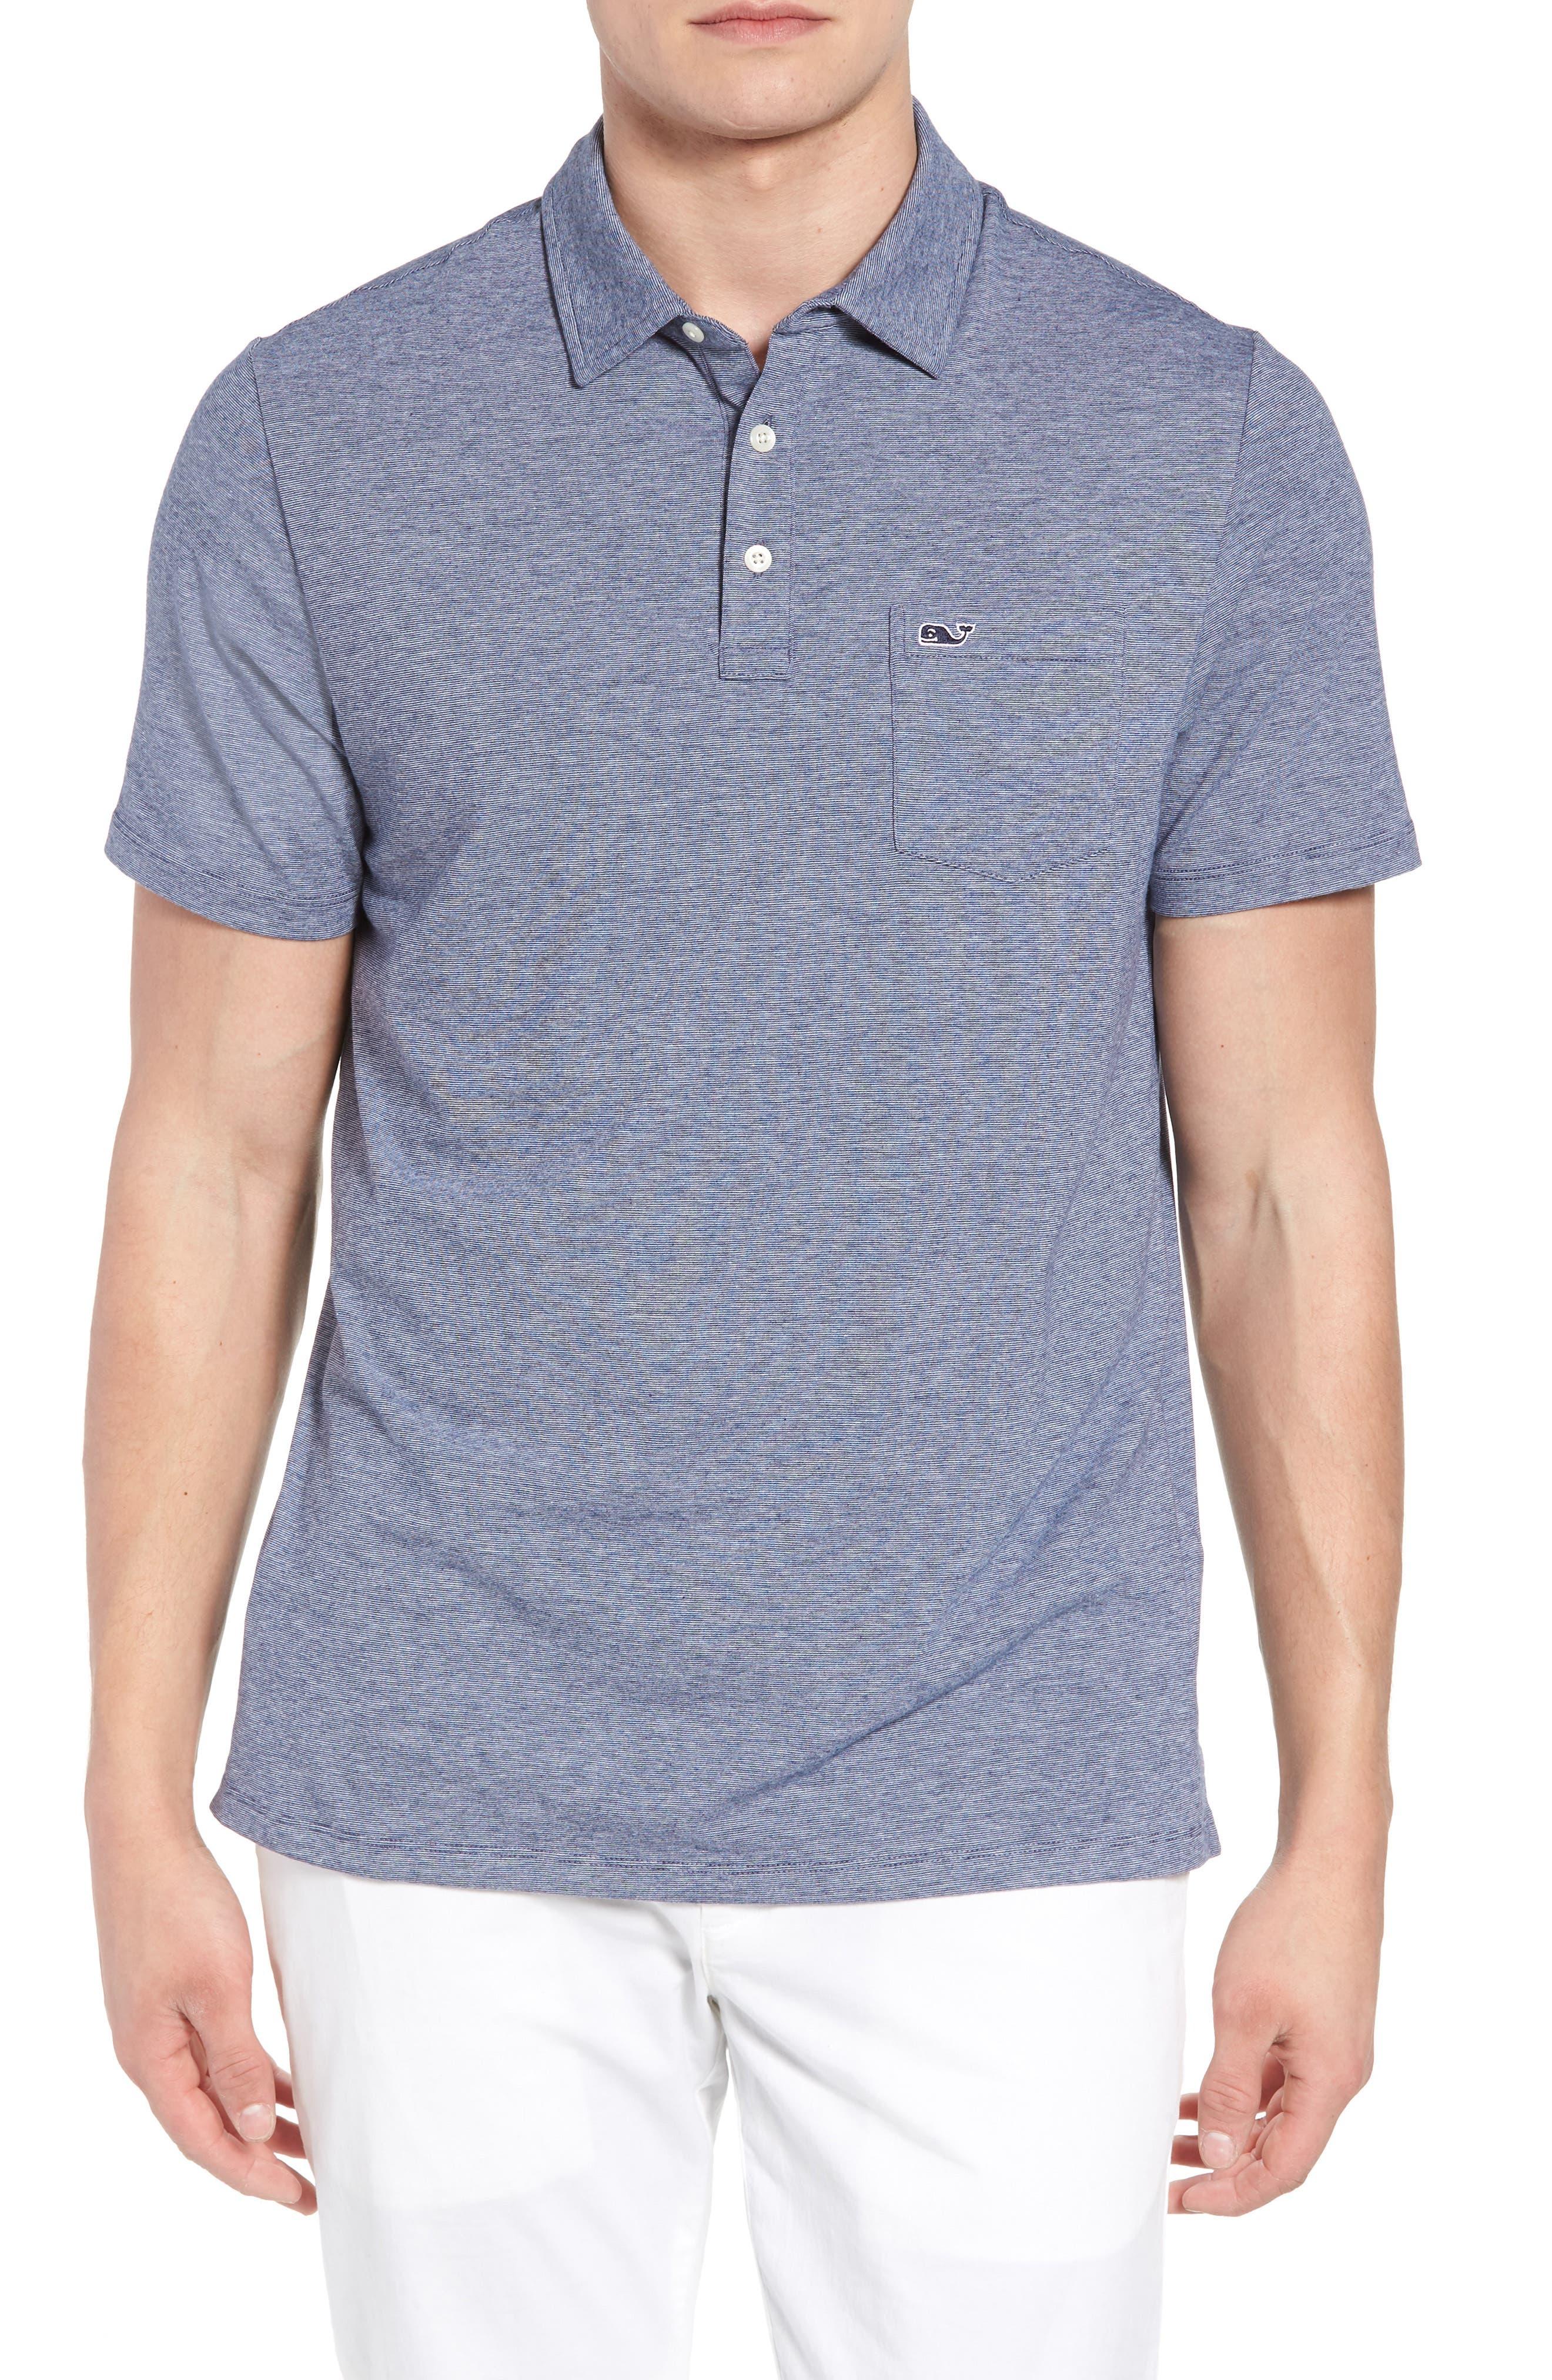 VINEYARD VINES,                             Edgartown Polo Shirt,                             Main thumbnail 1, color,                             DEEP BAY